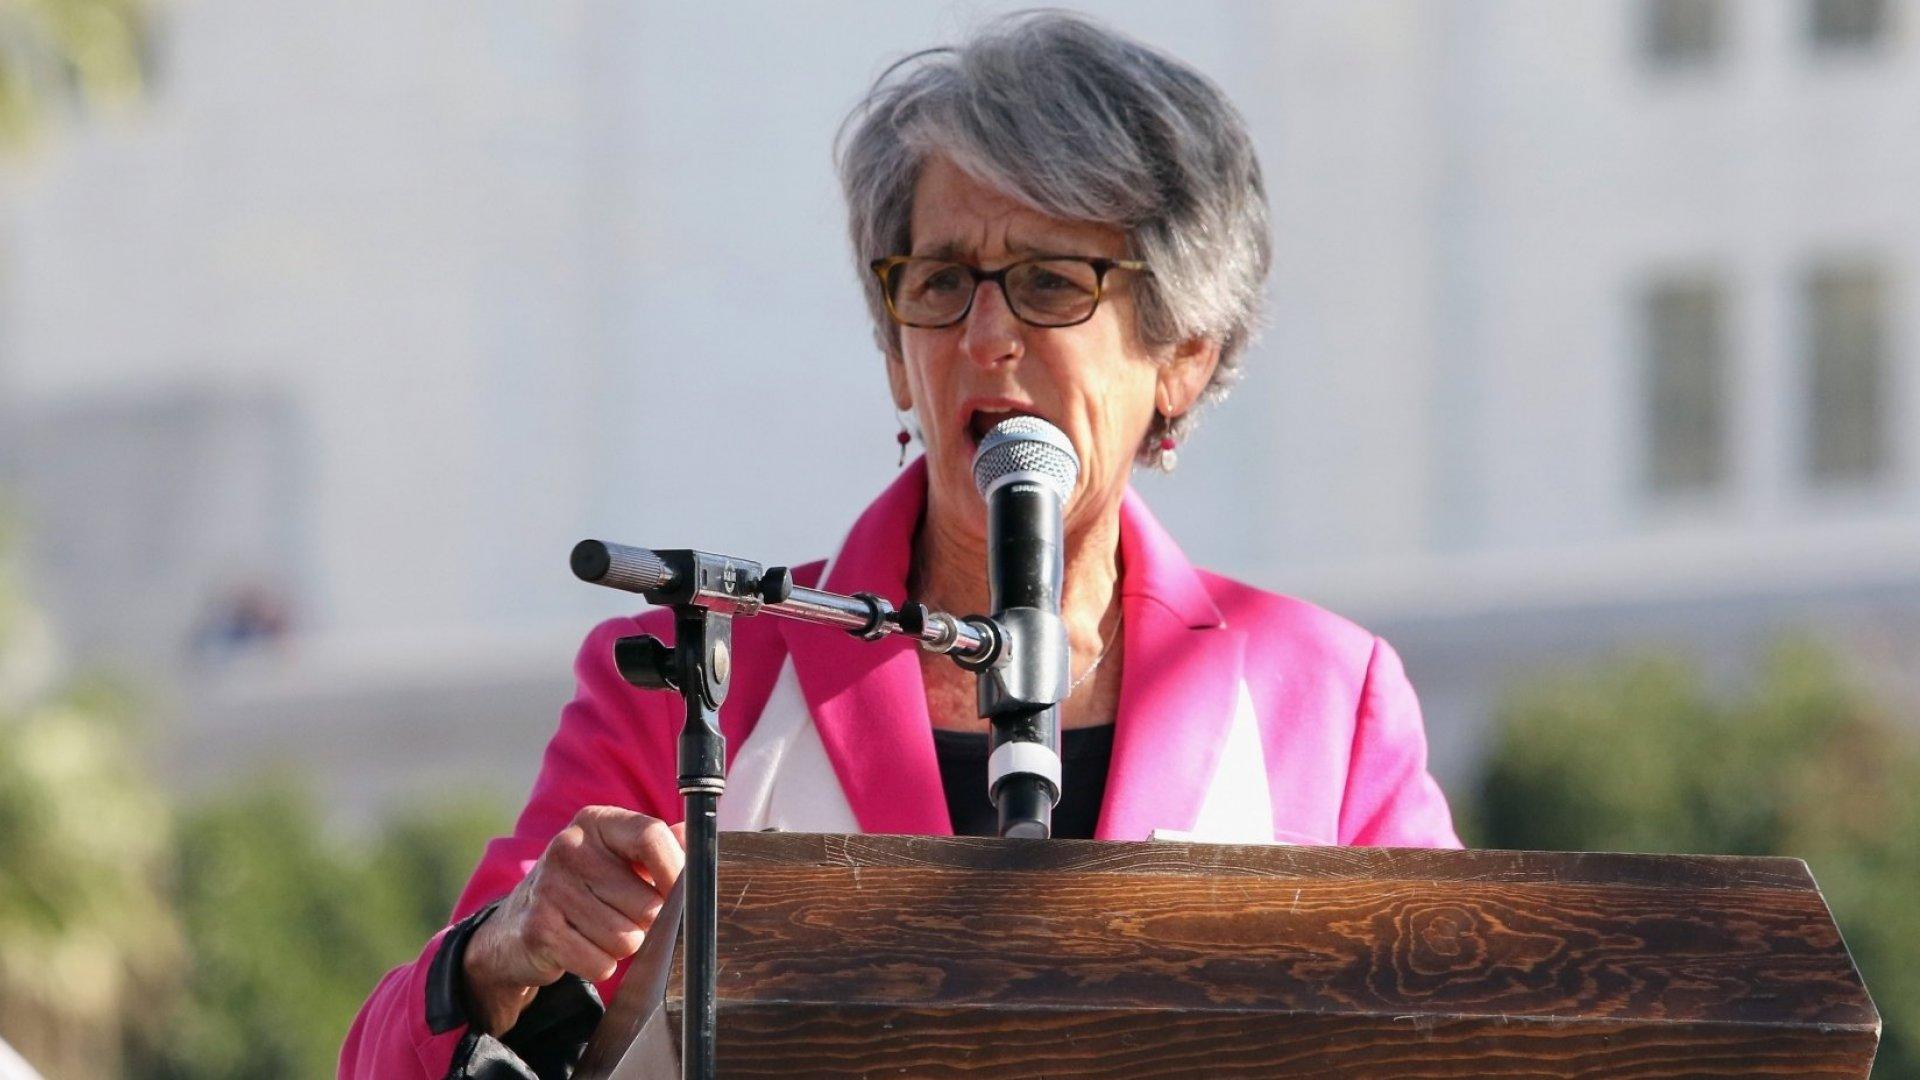 California Senator Hannah-Beth Jackson speaks during the Women's March Los Angeles on January 21, 2017 in Los Angeles, California.